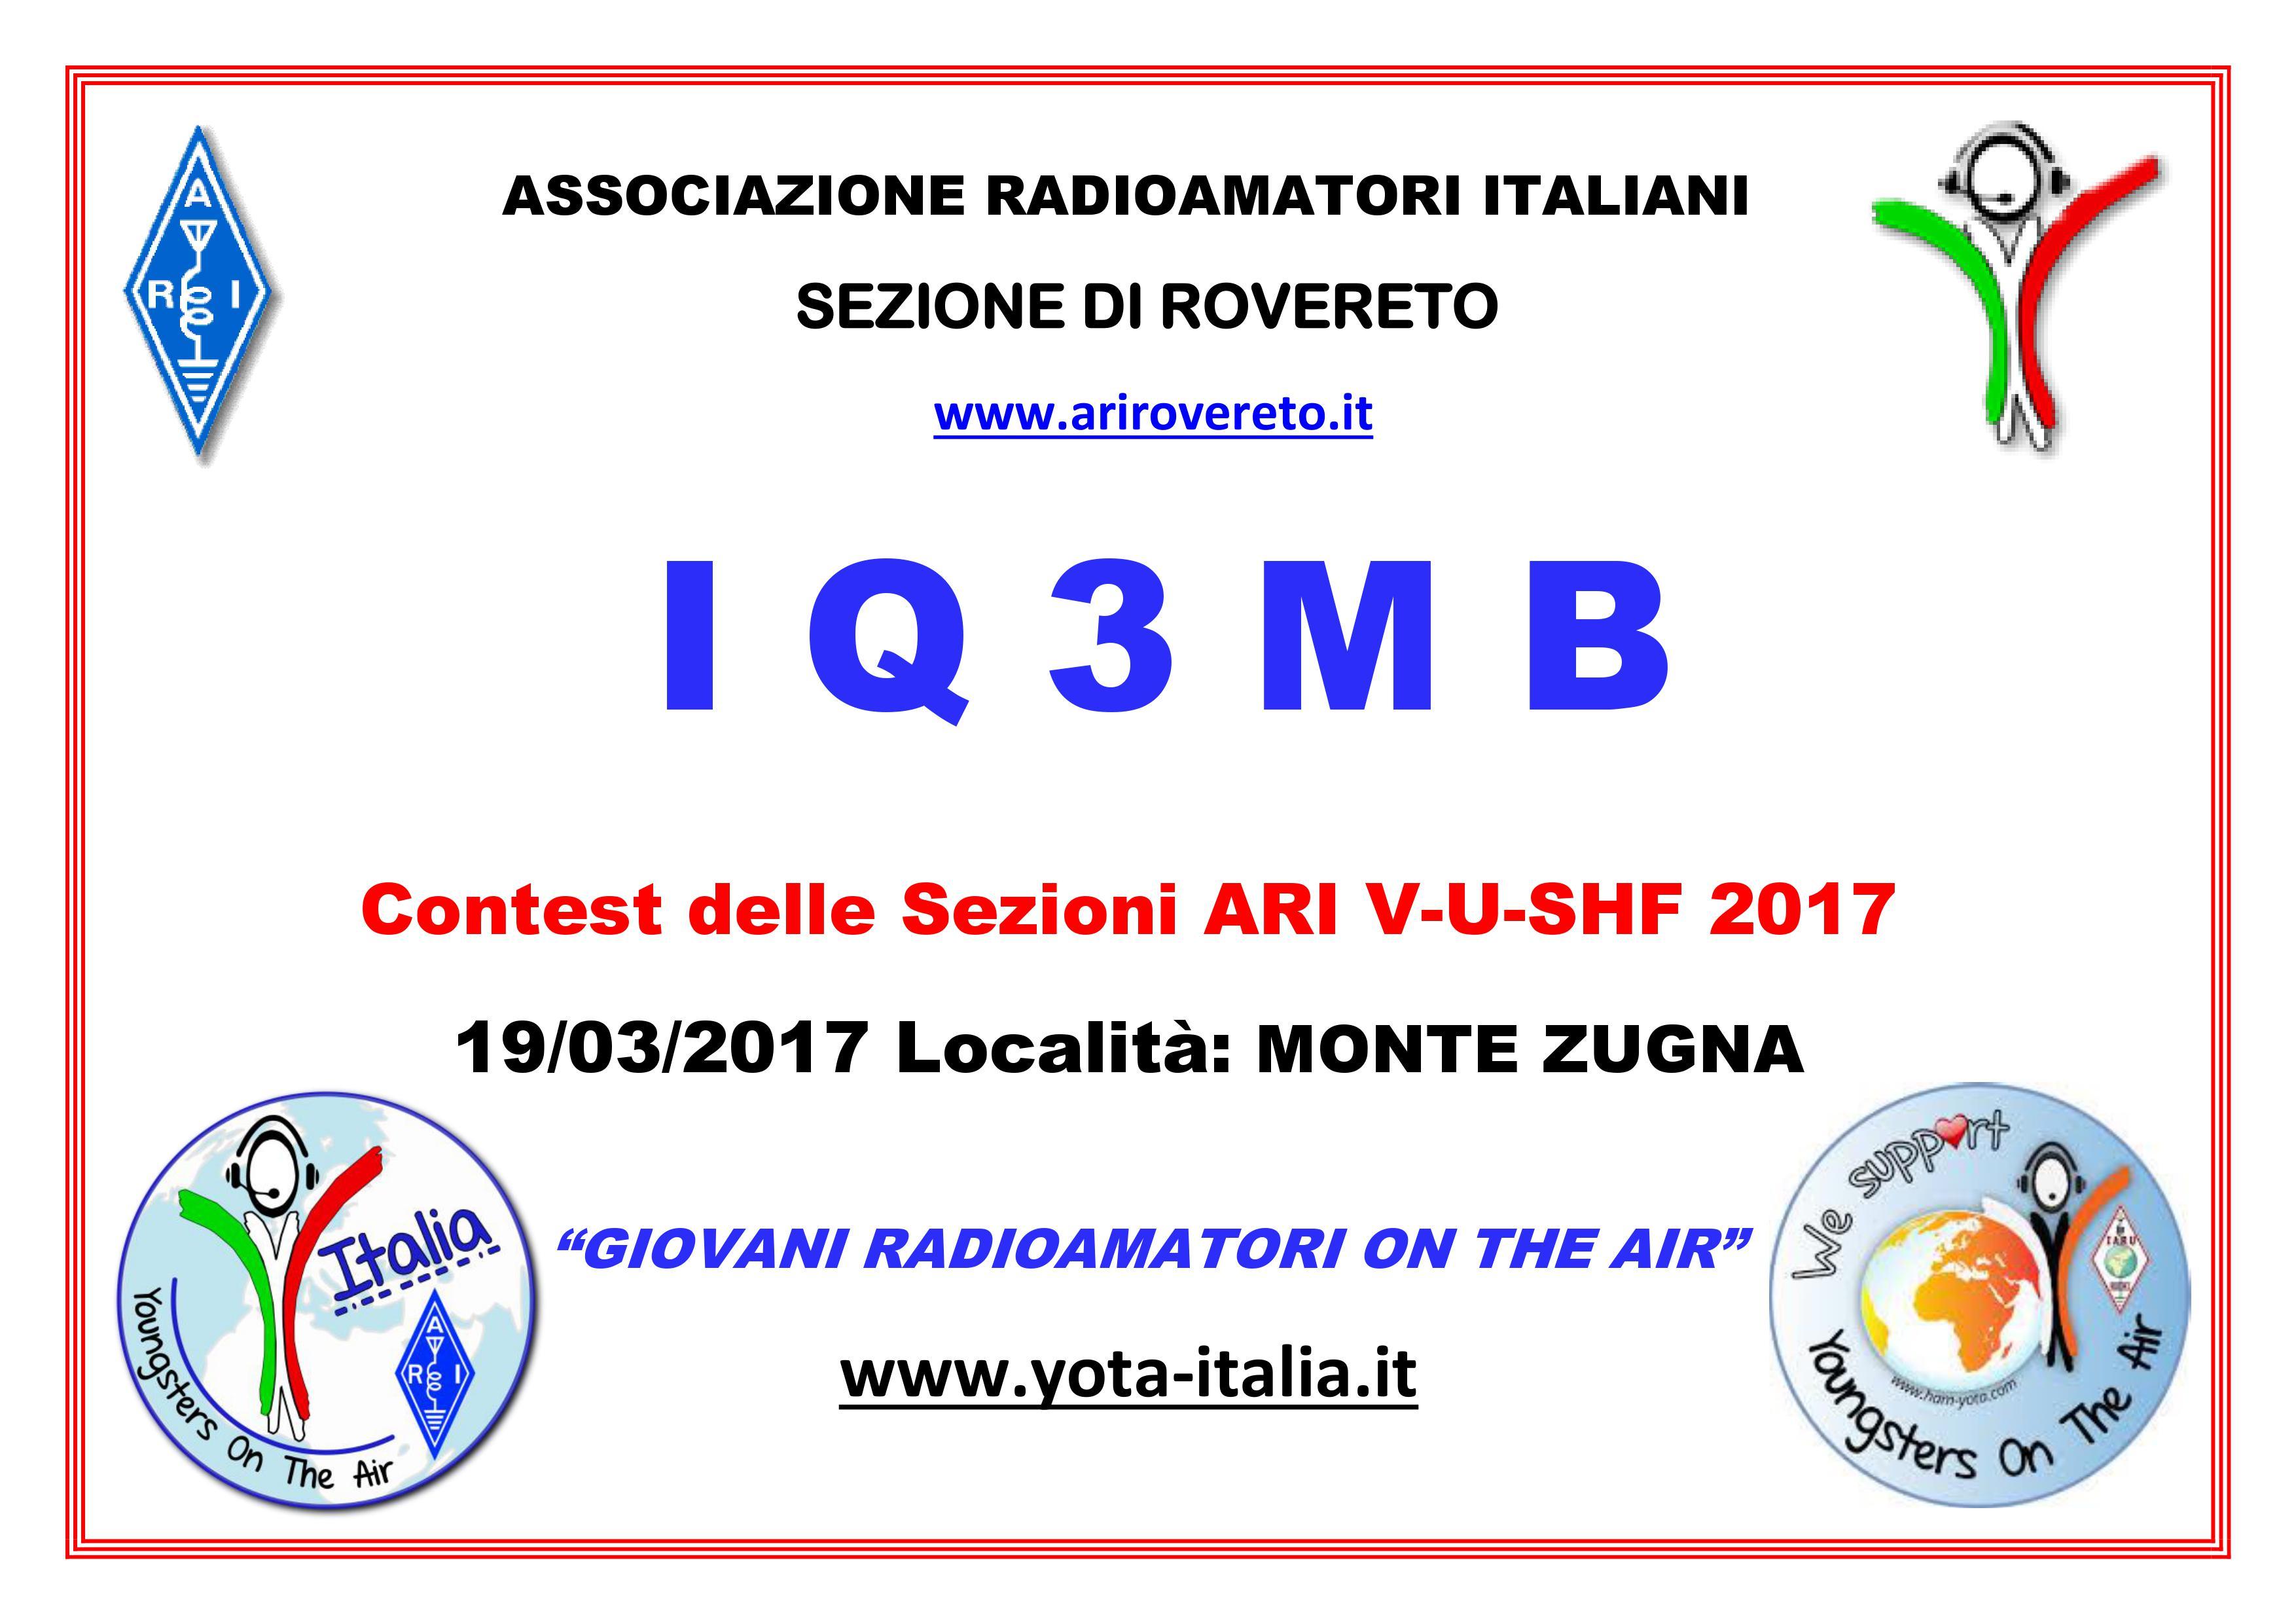 VHF FOTO